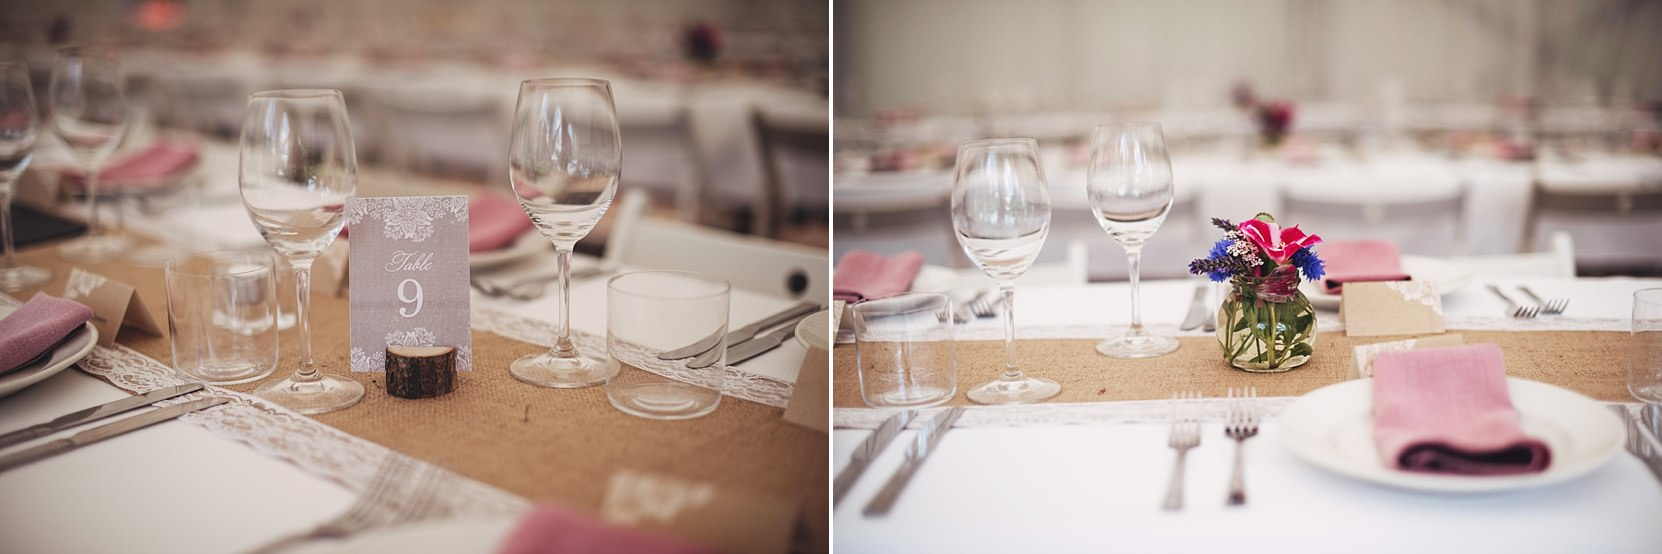 Cloughjordan-Wedding-Photography_0025